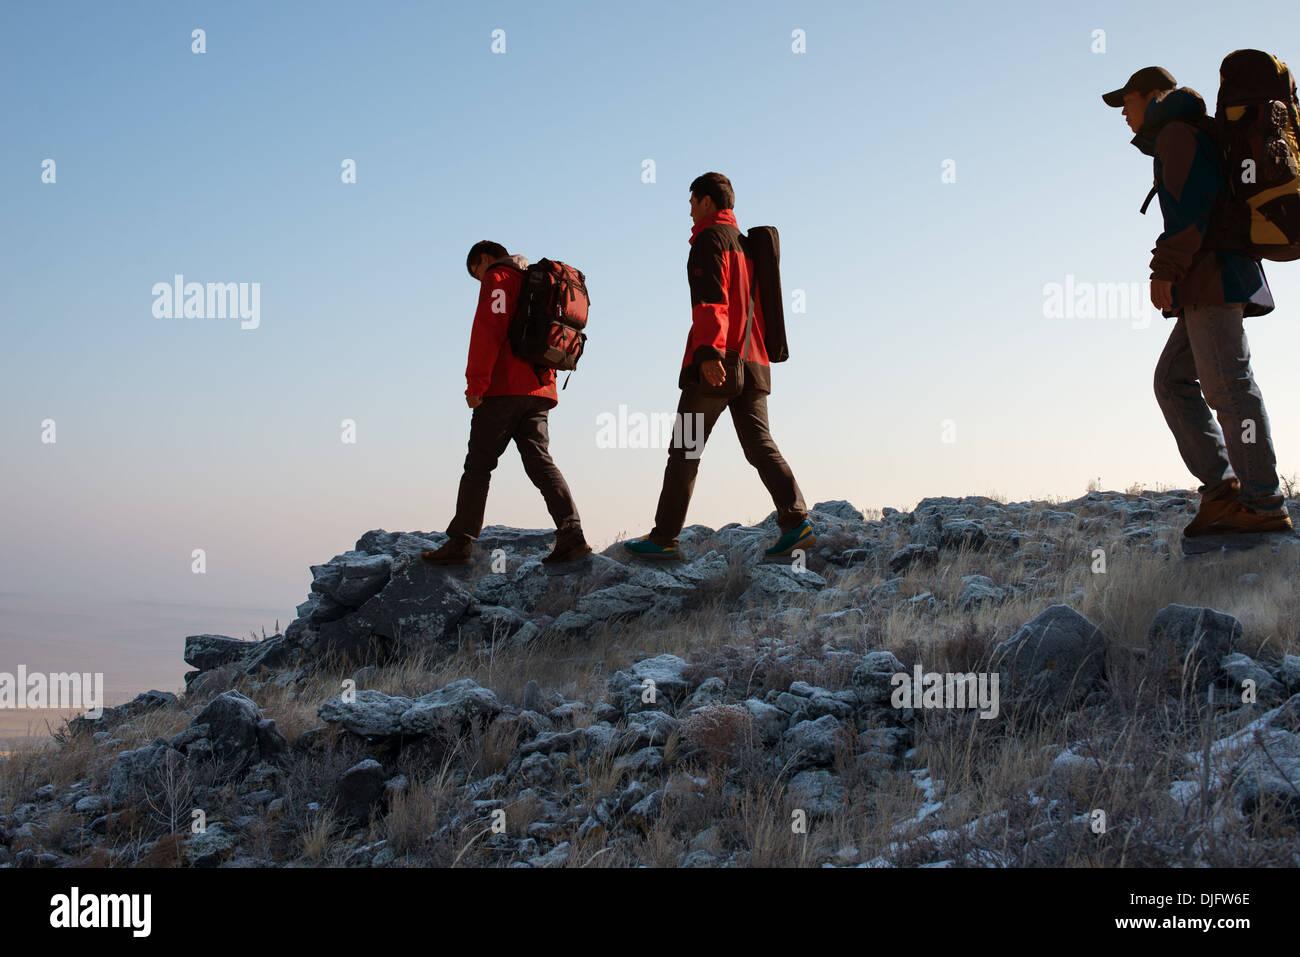 Trekking In Mountains Greet The Morning Sun Stock Photo 63043974